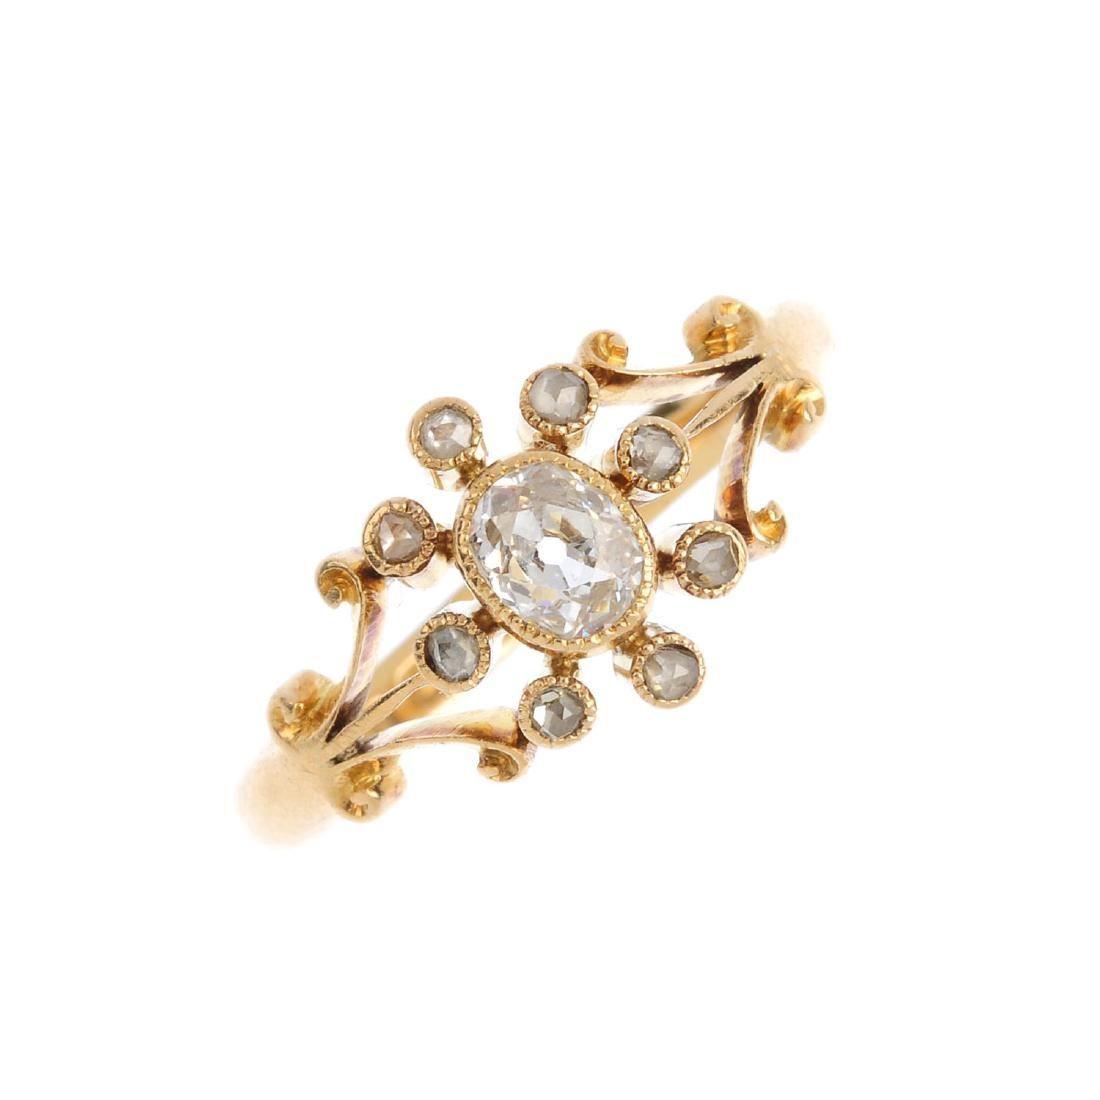 An Edwardian 18ct gold diamond dress ring. The old-cut